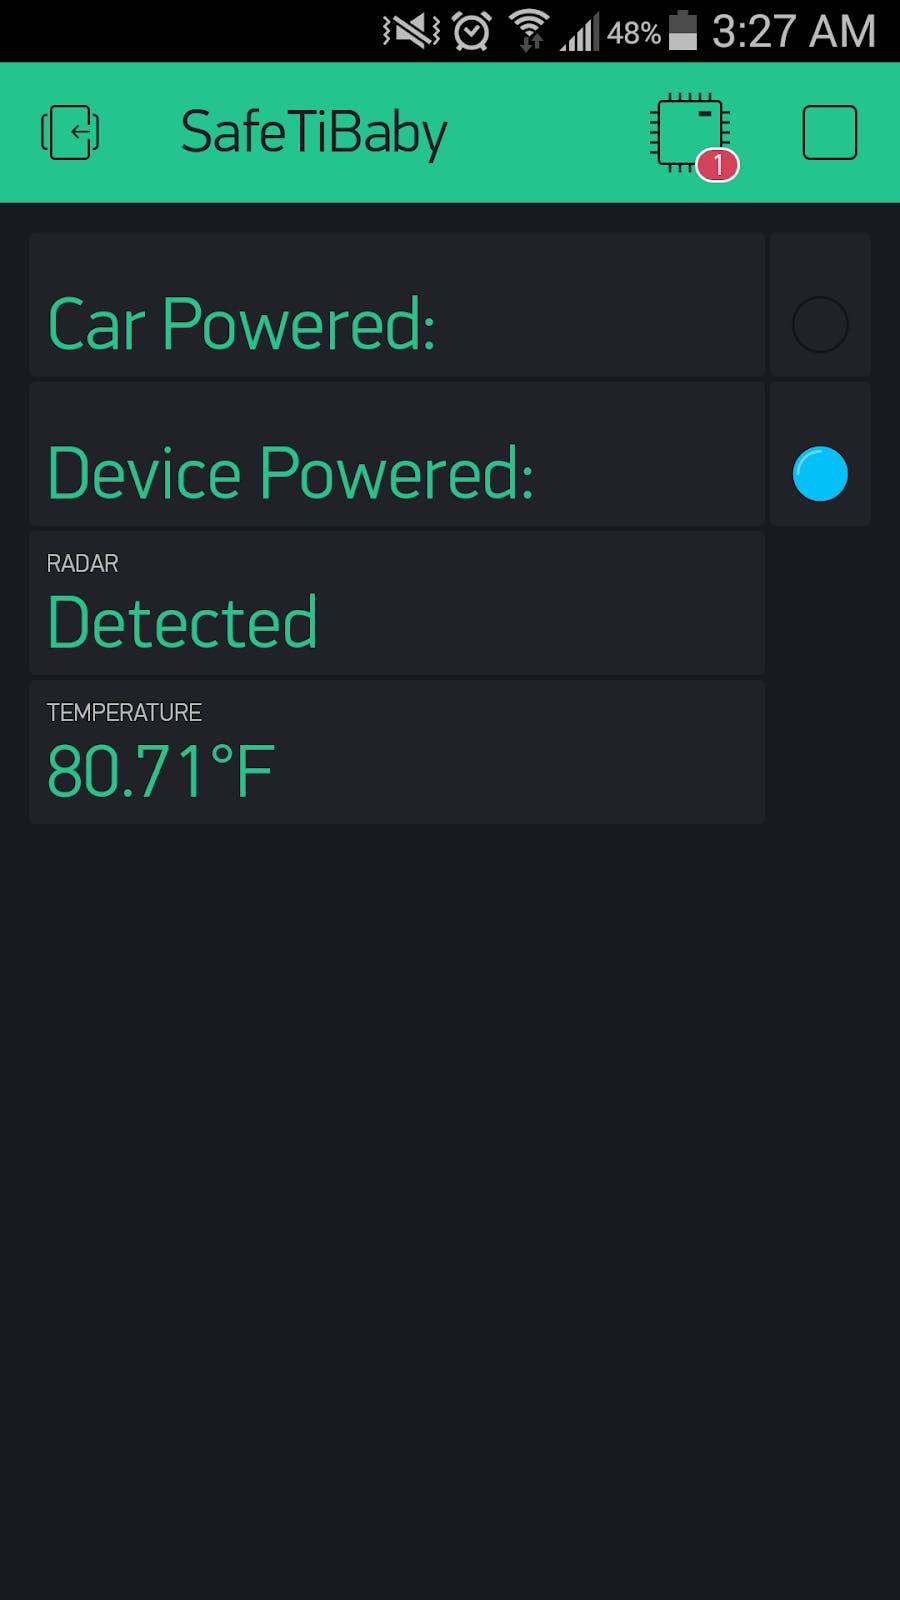 SafeTiBaby app Implemented via Blynk